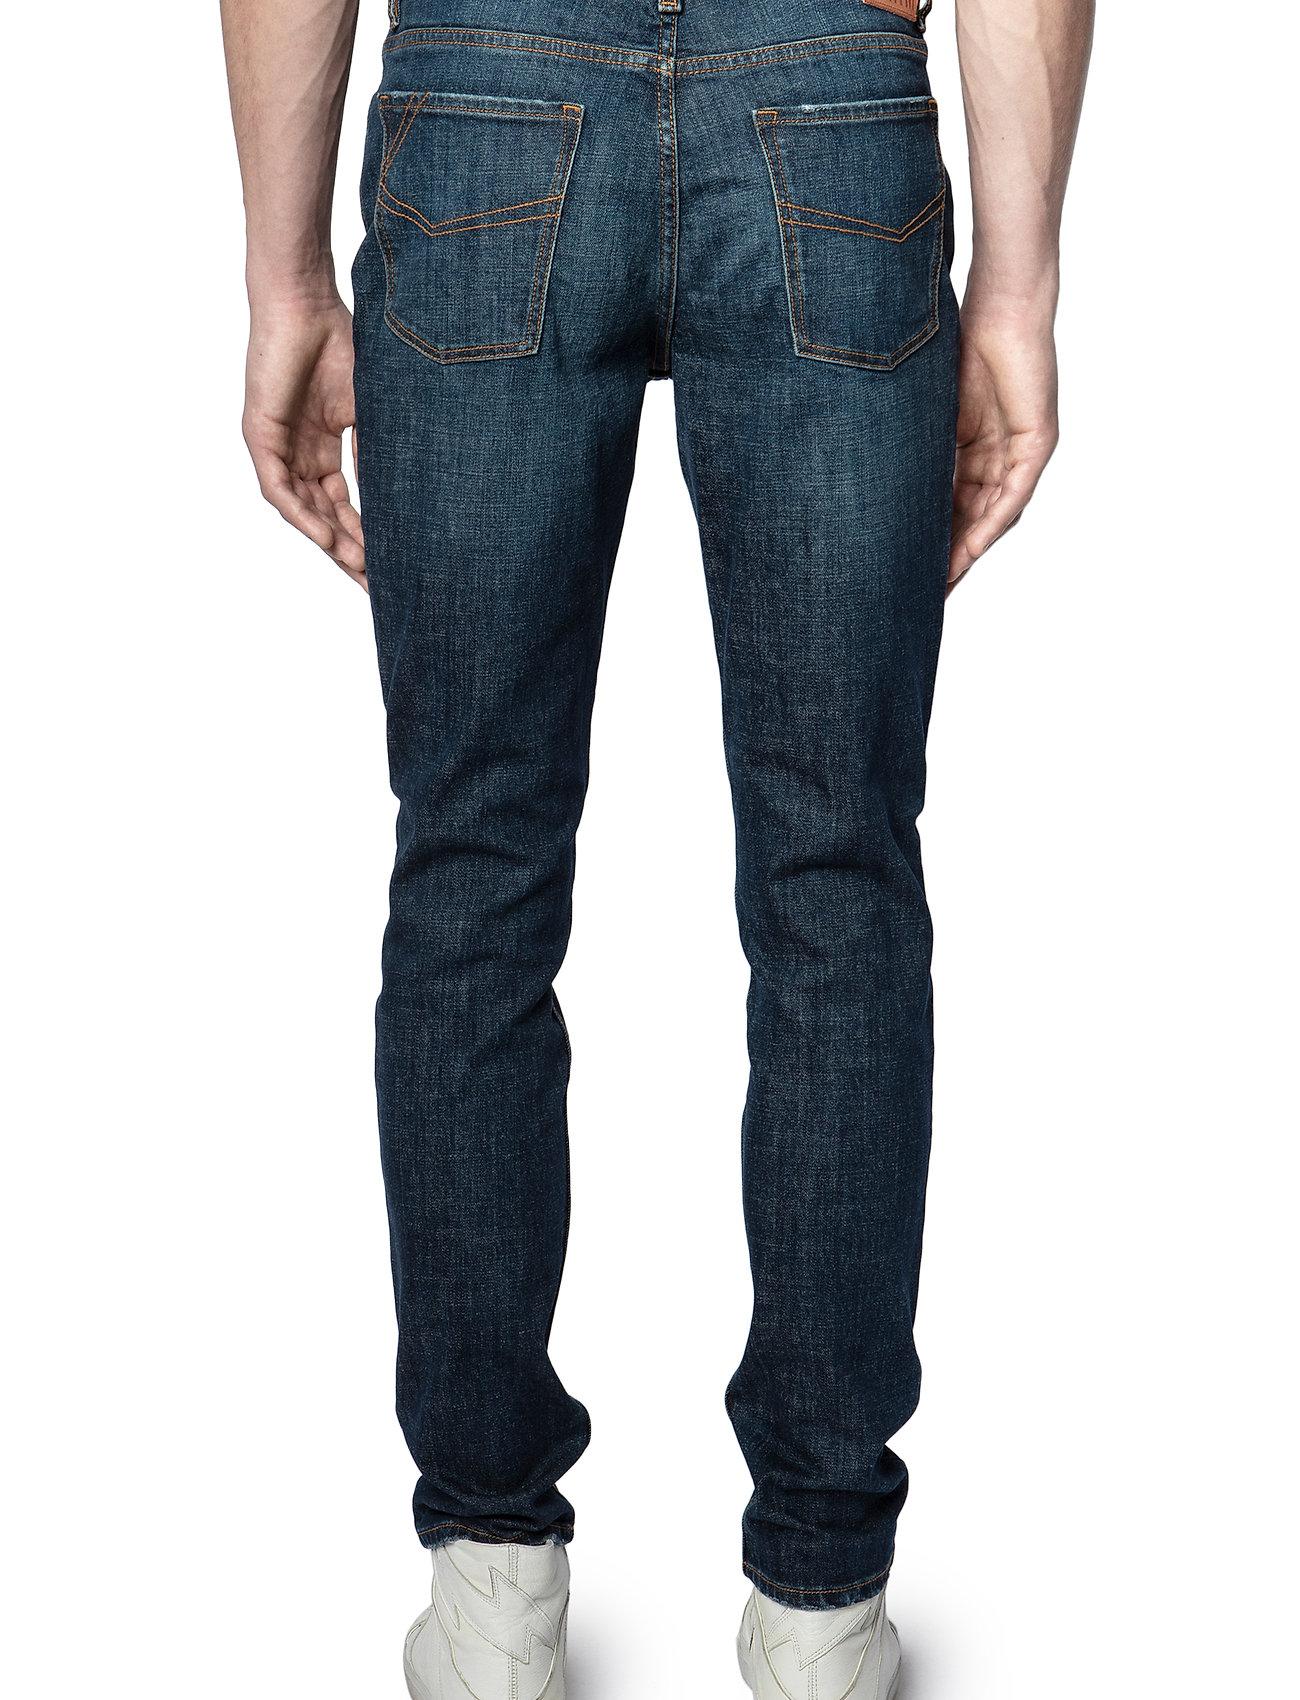 Zadig & Voltaire - DAVID ECO OLD BRUT - slim jeans - blue - 3